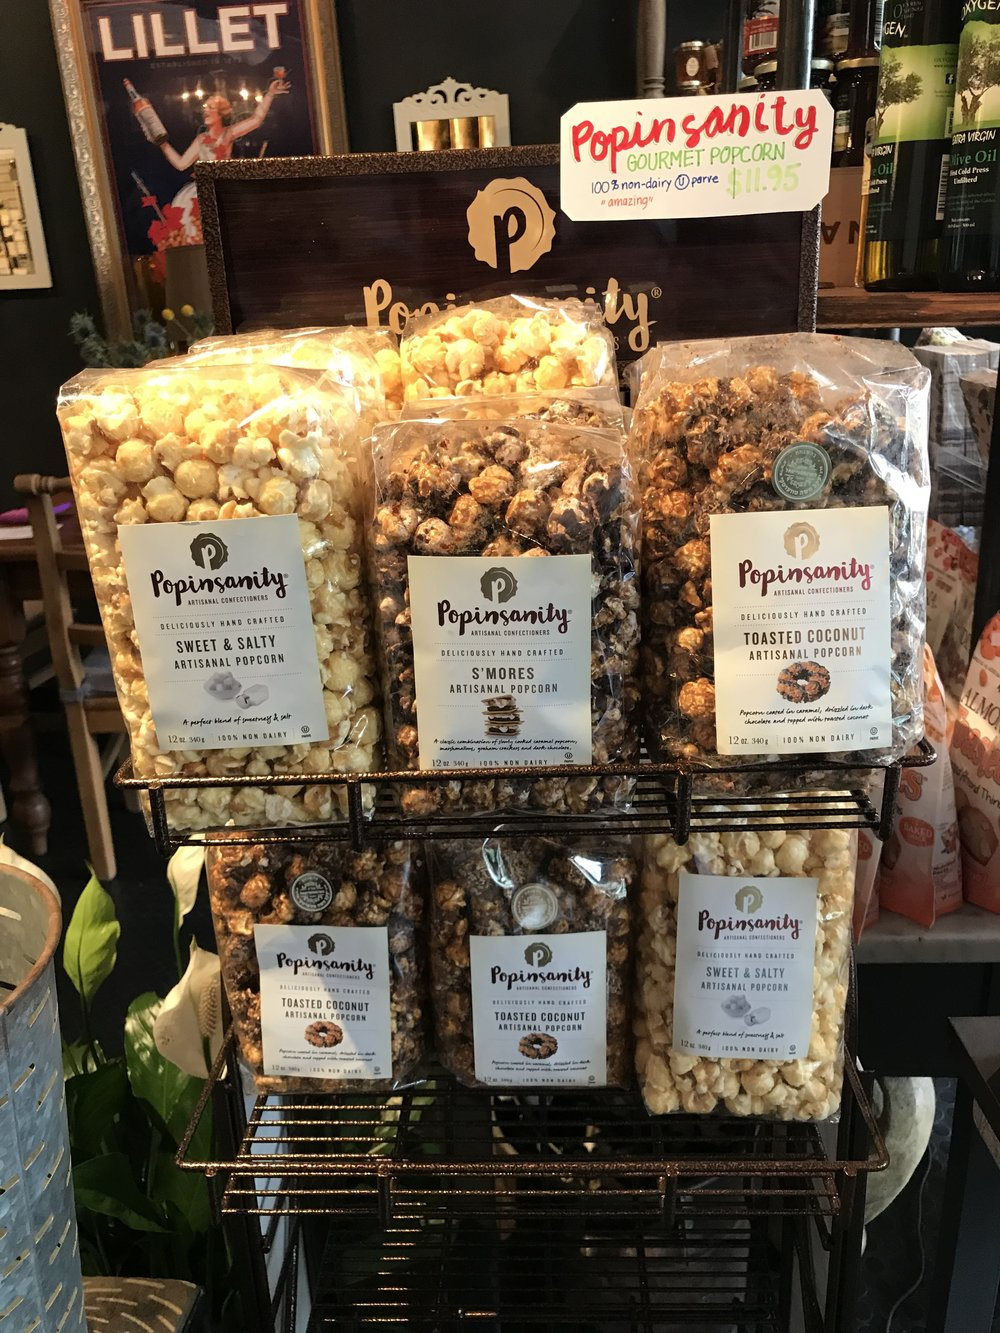 Popinsanity Gourmet Popcorn